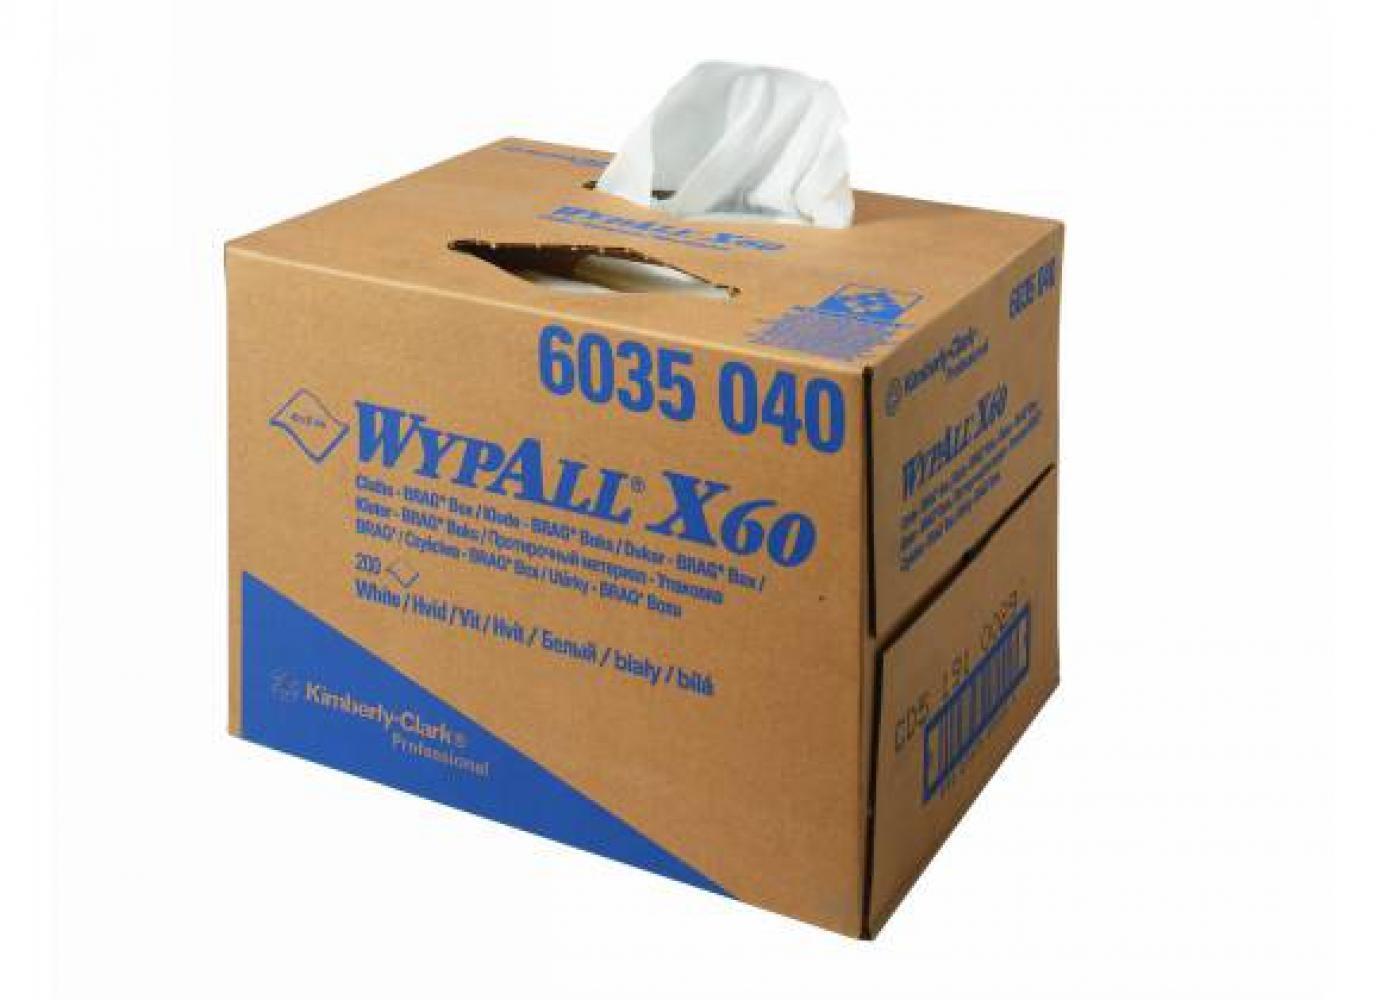 Acquista 200 Pezzi Wypall X60 Brag Box 17545670 | Glooke.com